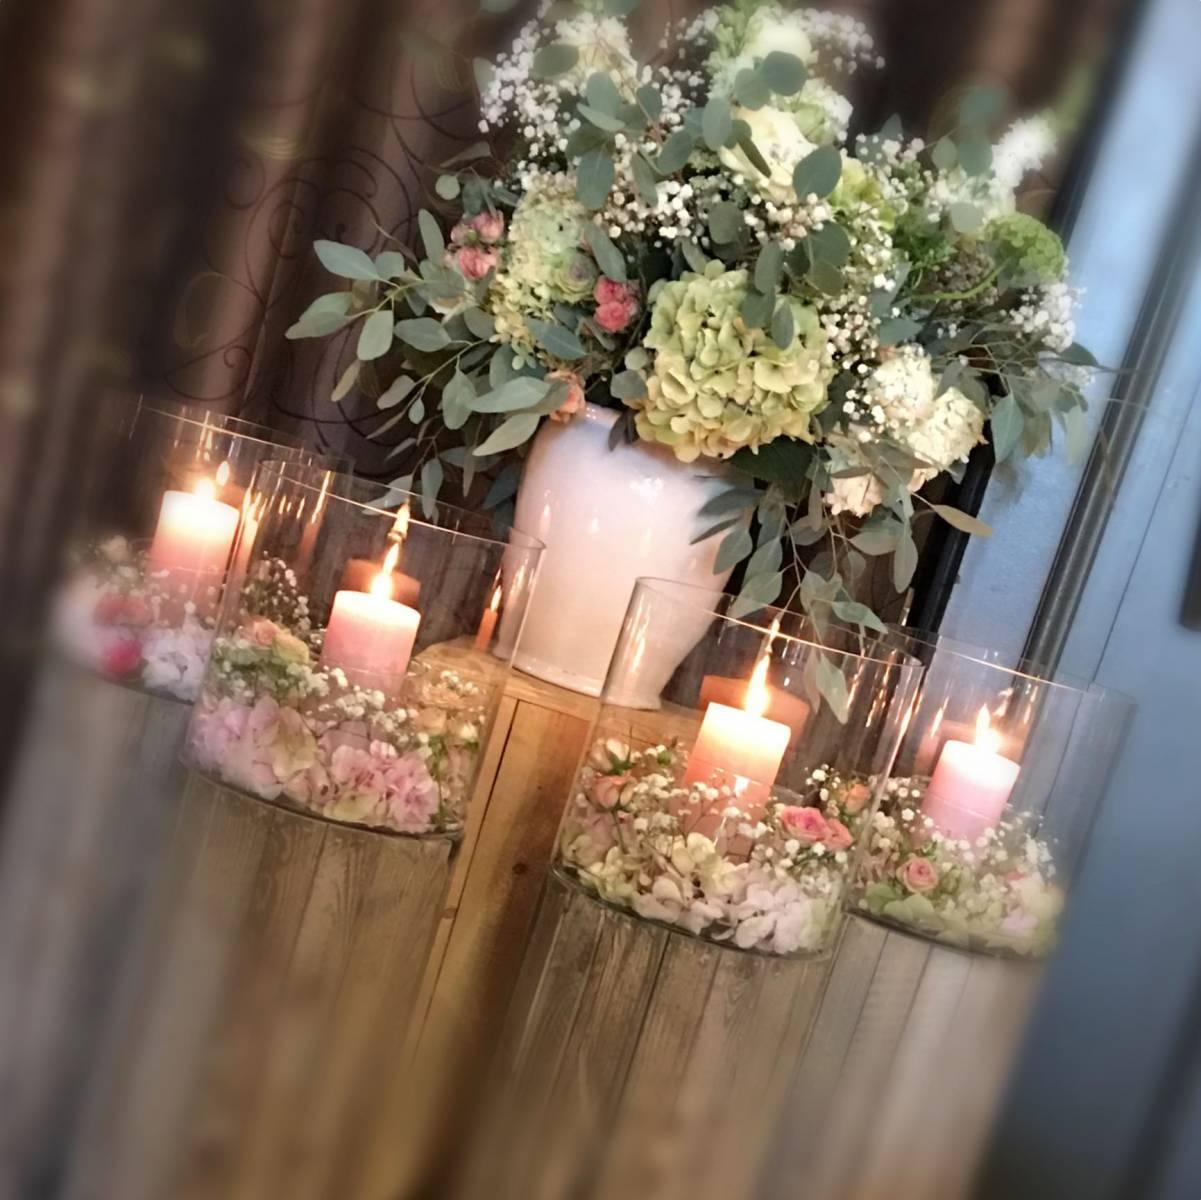 Maison Fleurie - Fotograaf zelfgetrokken - House of Weddings - 17